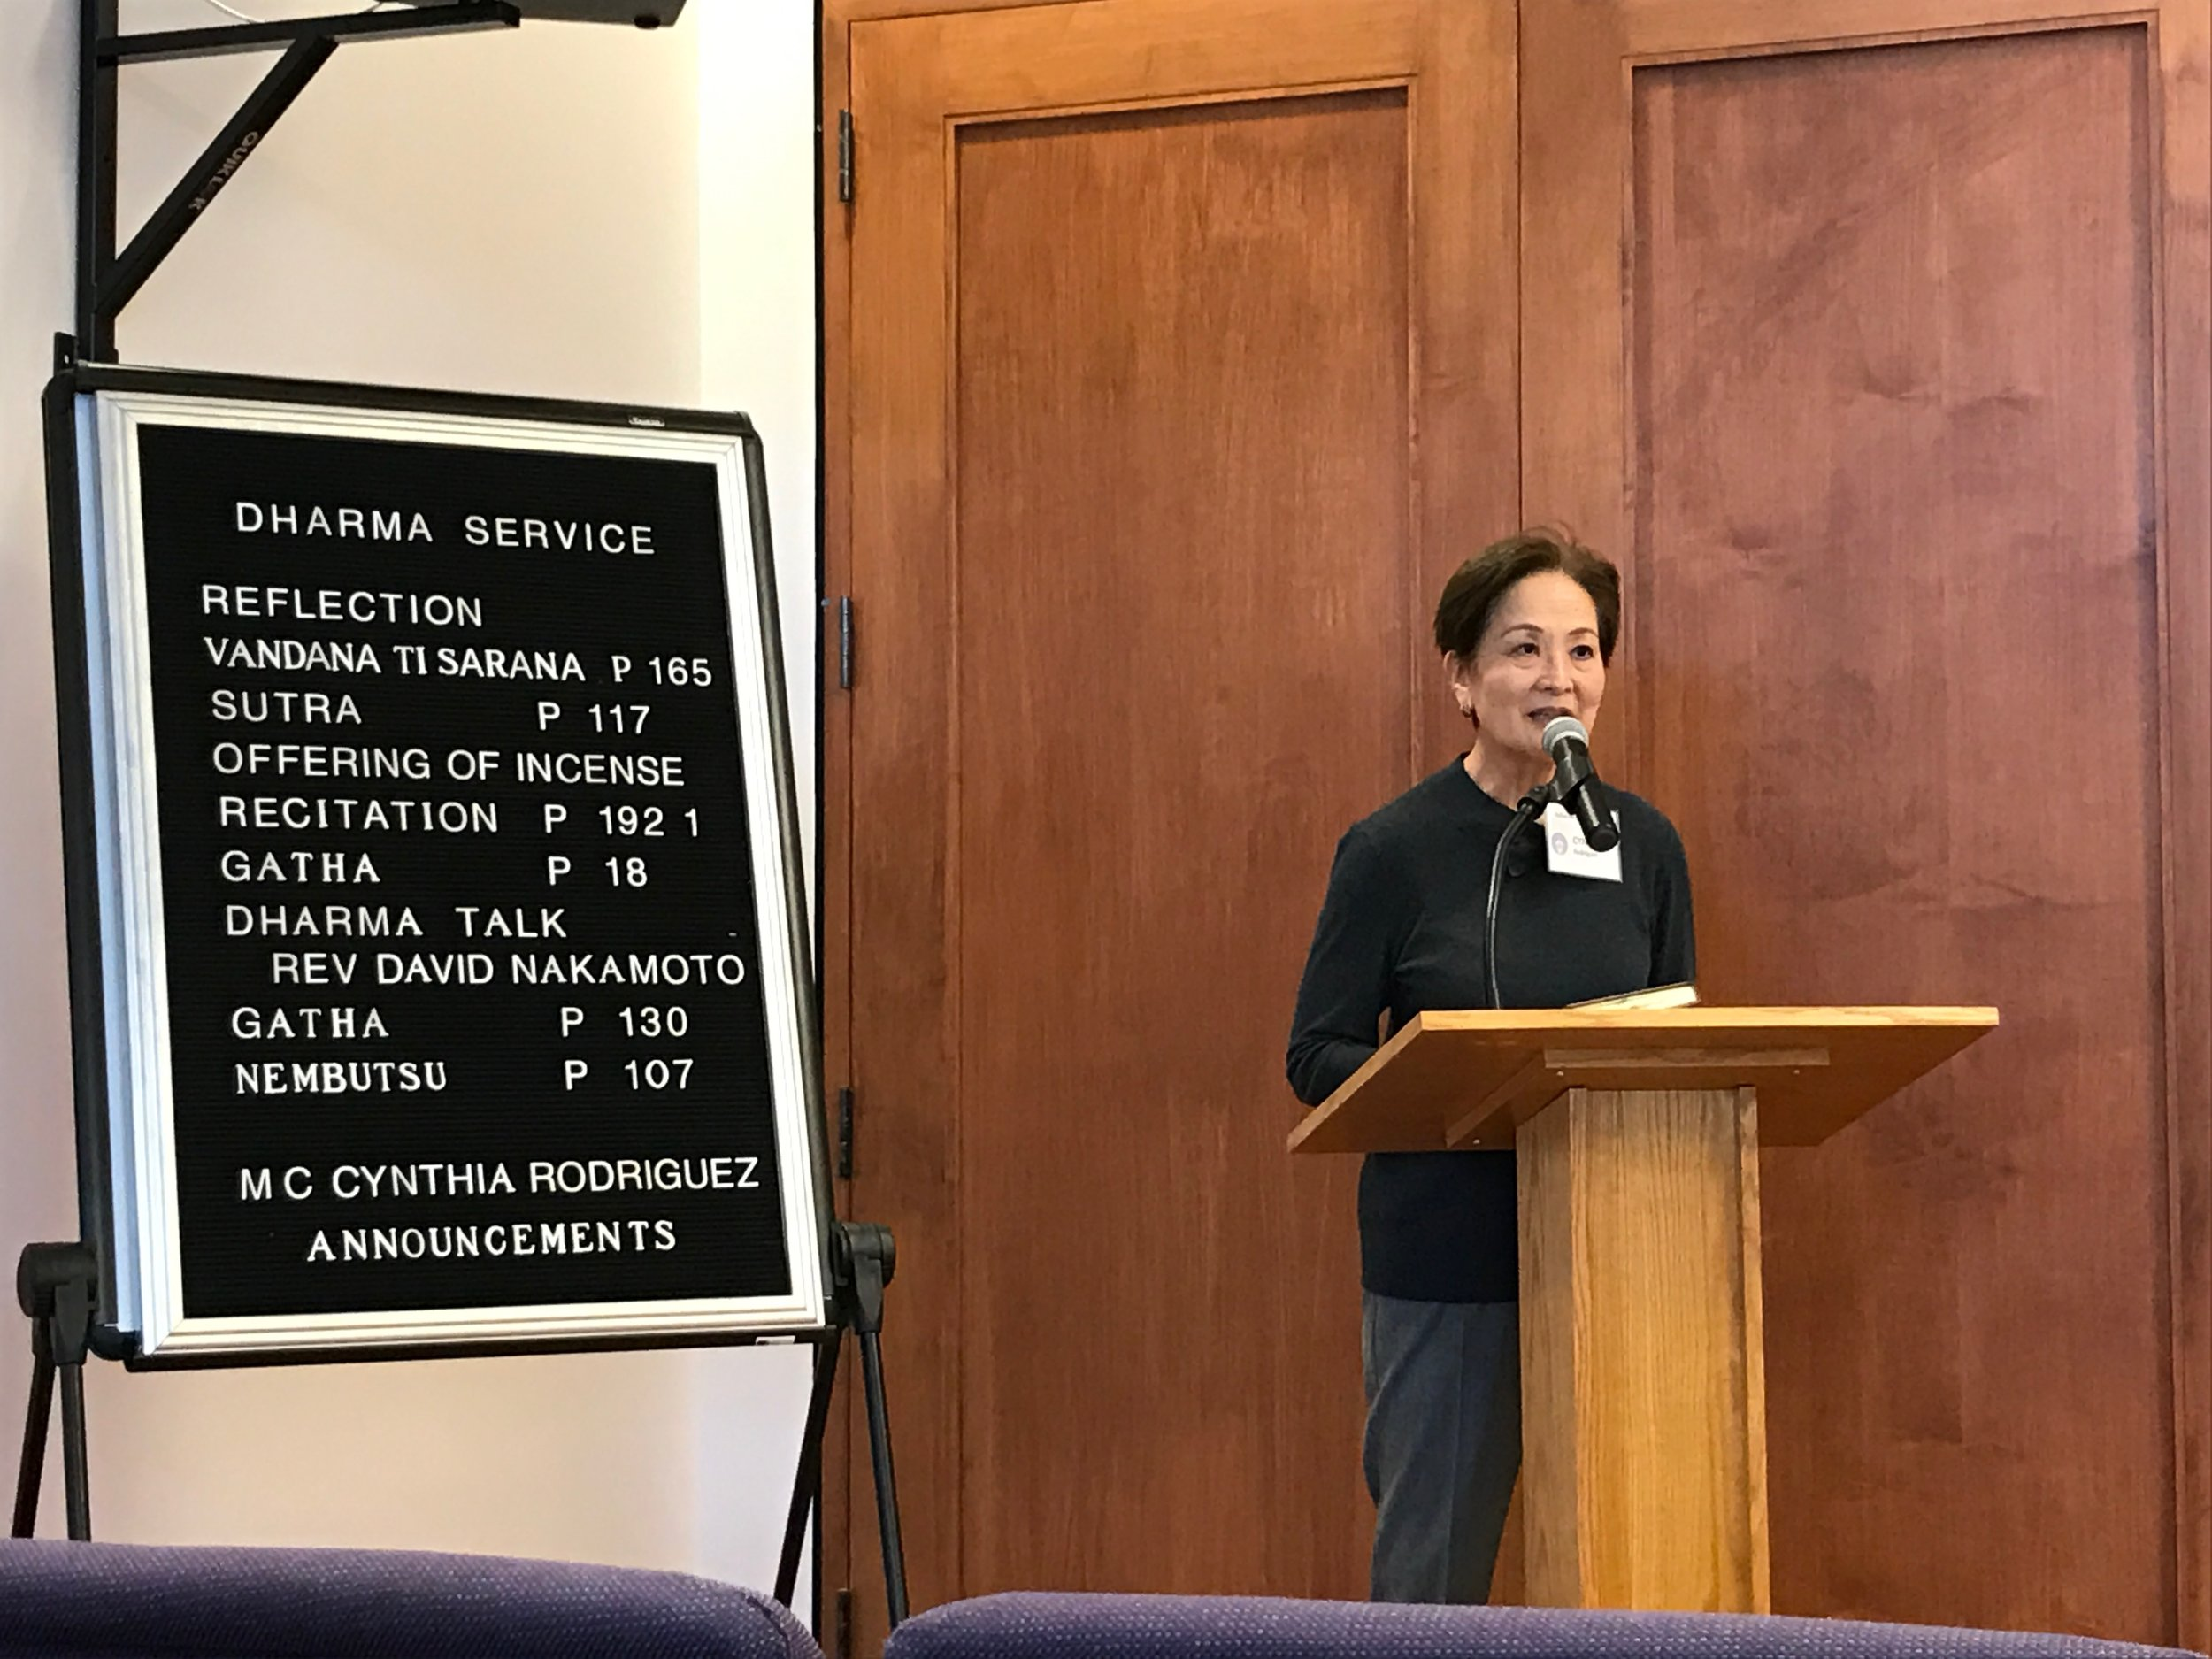 M.C. Cynthia Rodriguez begins the service